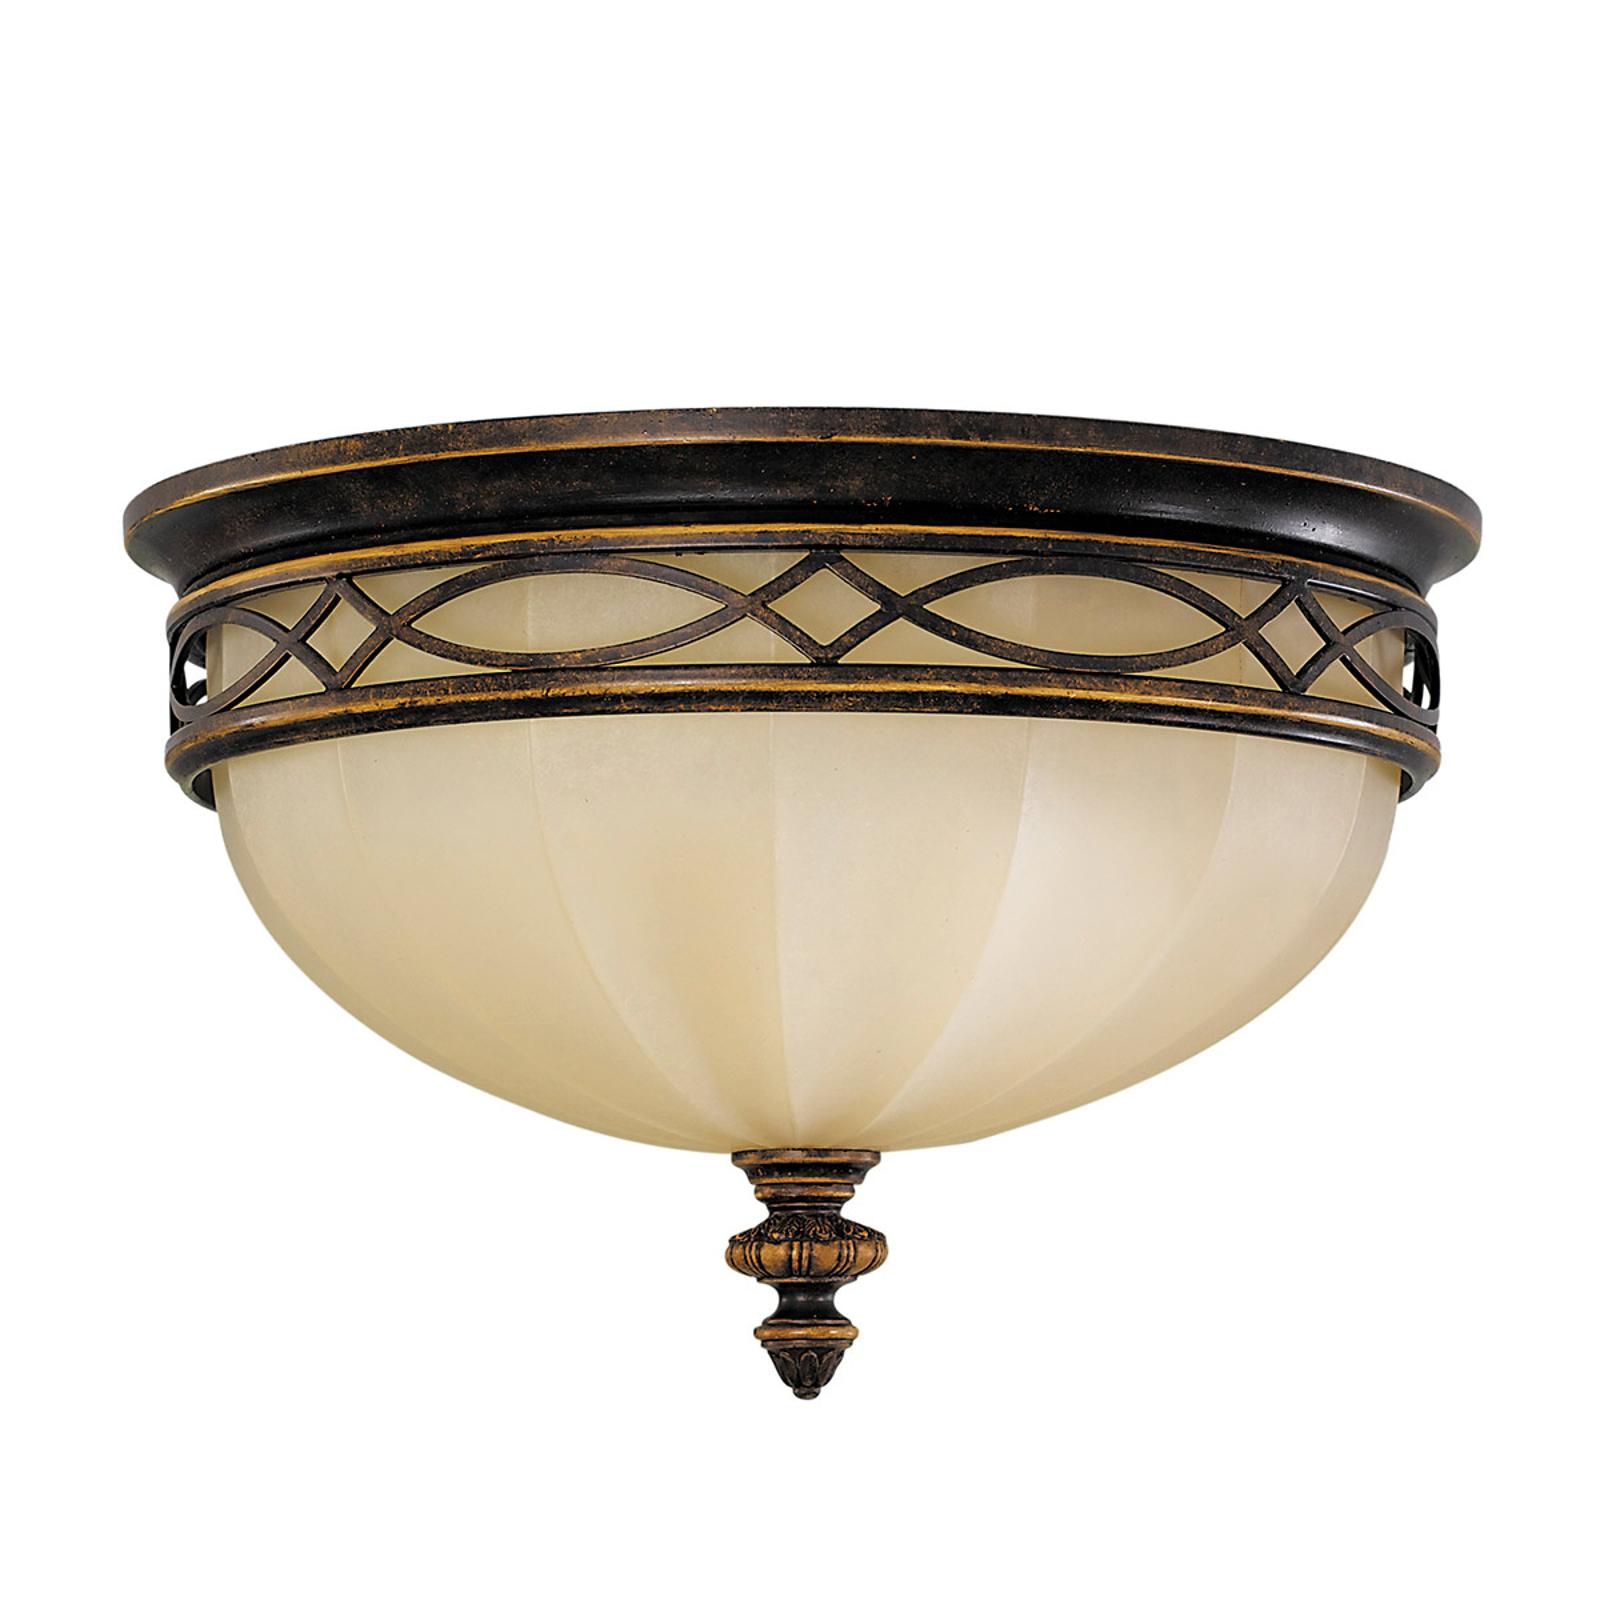 Drawing Room - taklampa med scavo-glas